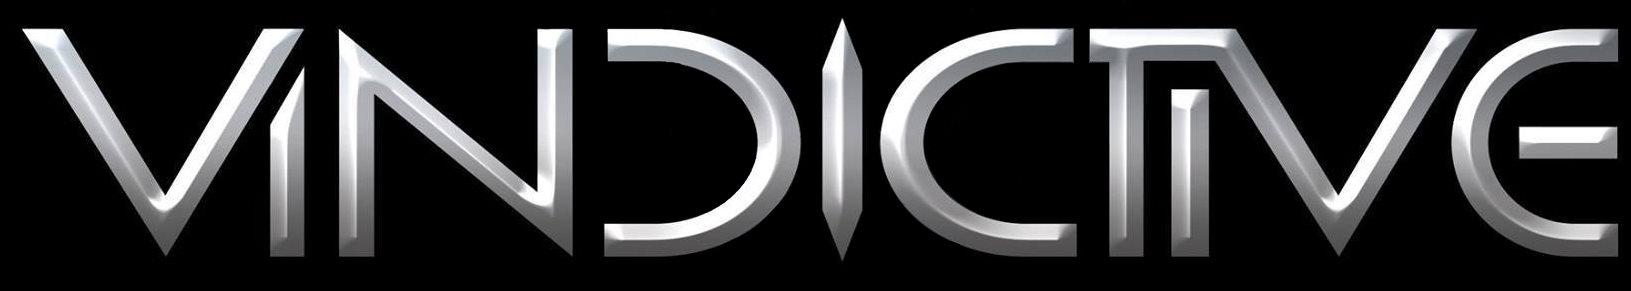 Vindictive - Logo